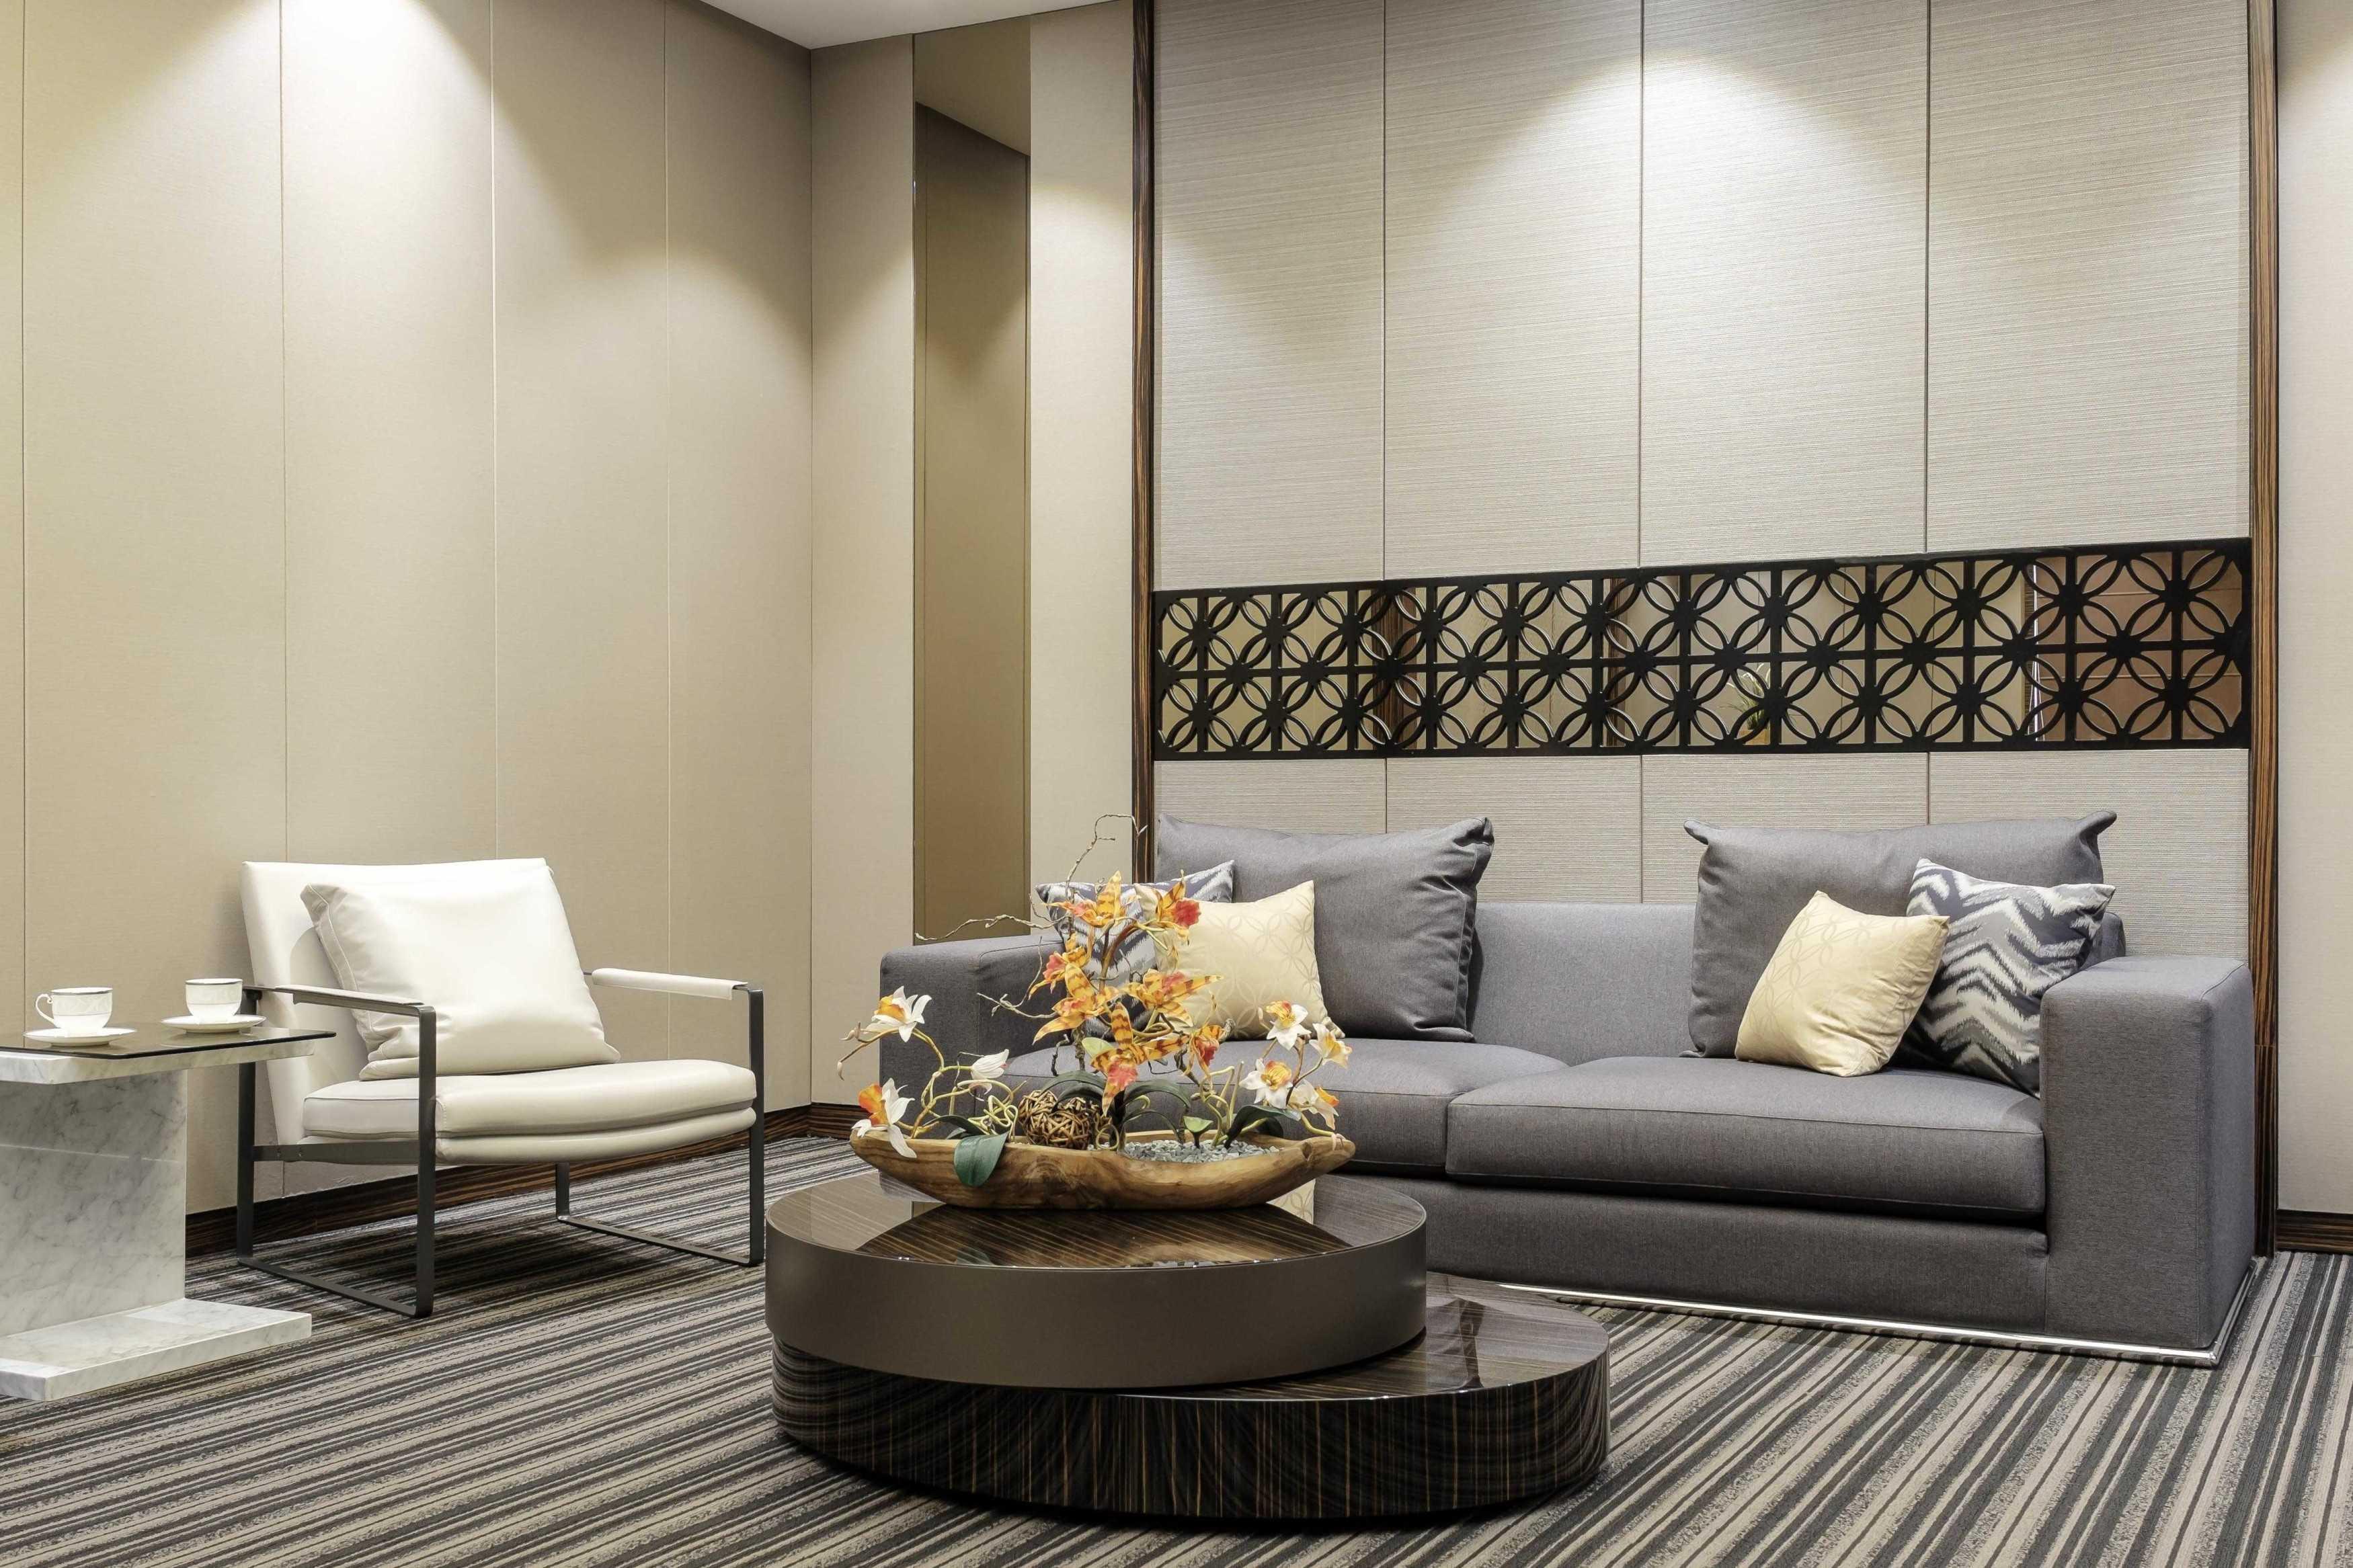 Vin•da•te Cv. Berkah - Office Project Jakarta-Indonesia Jakarta-Indonesia Seating Area Kontemporer  17346